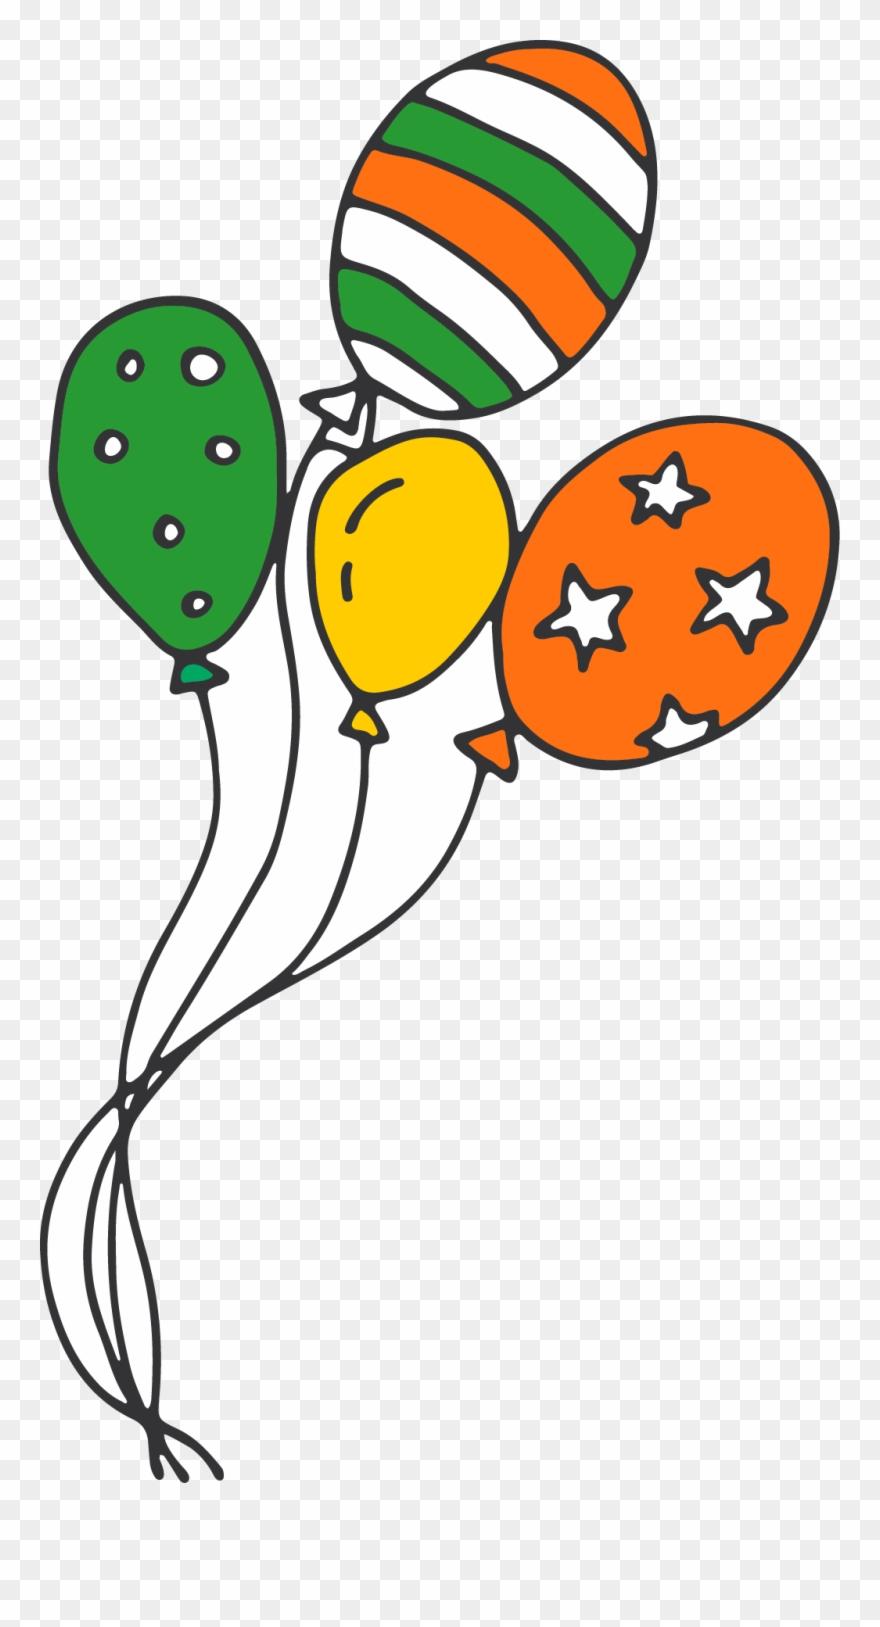 hight resolution of irish party balloons clipart